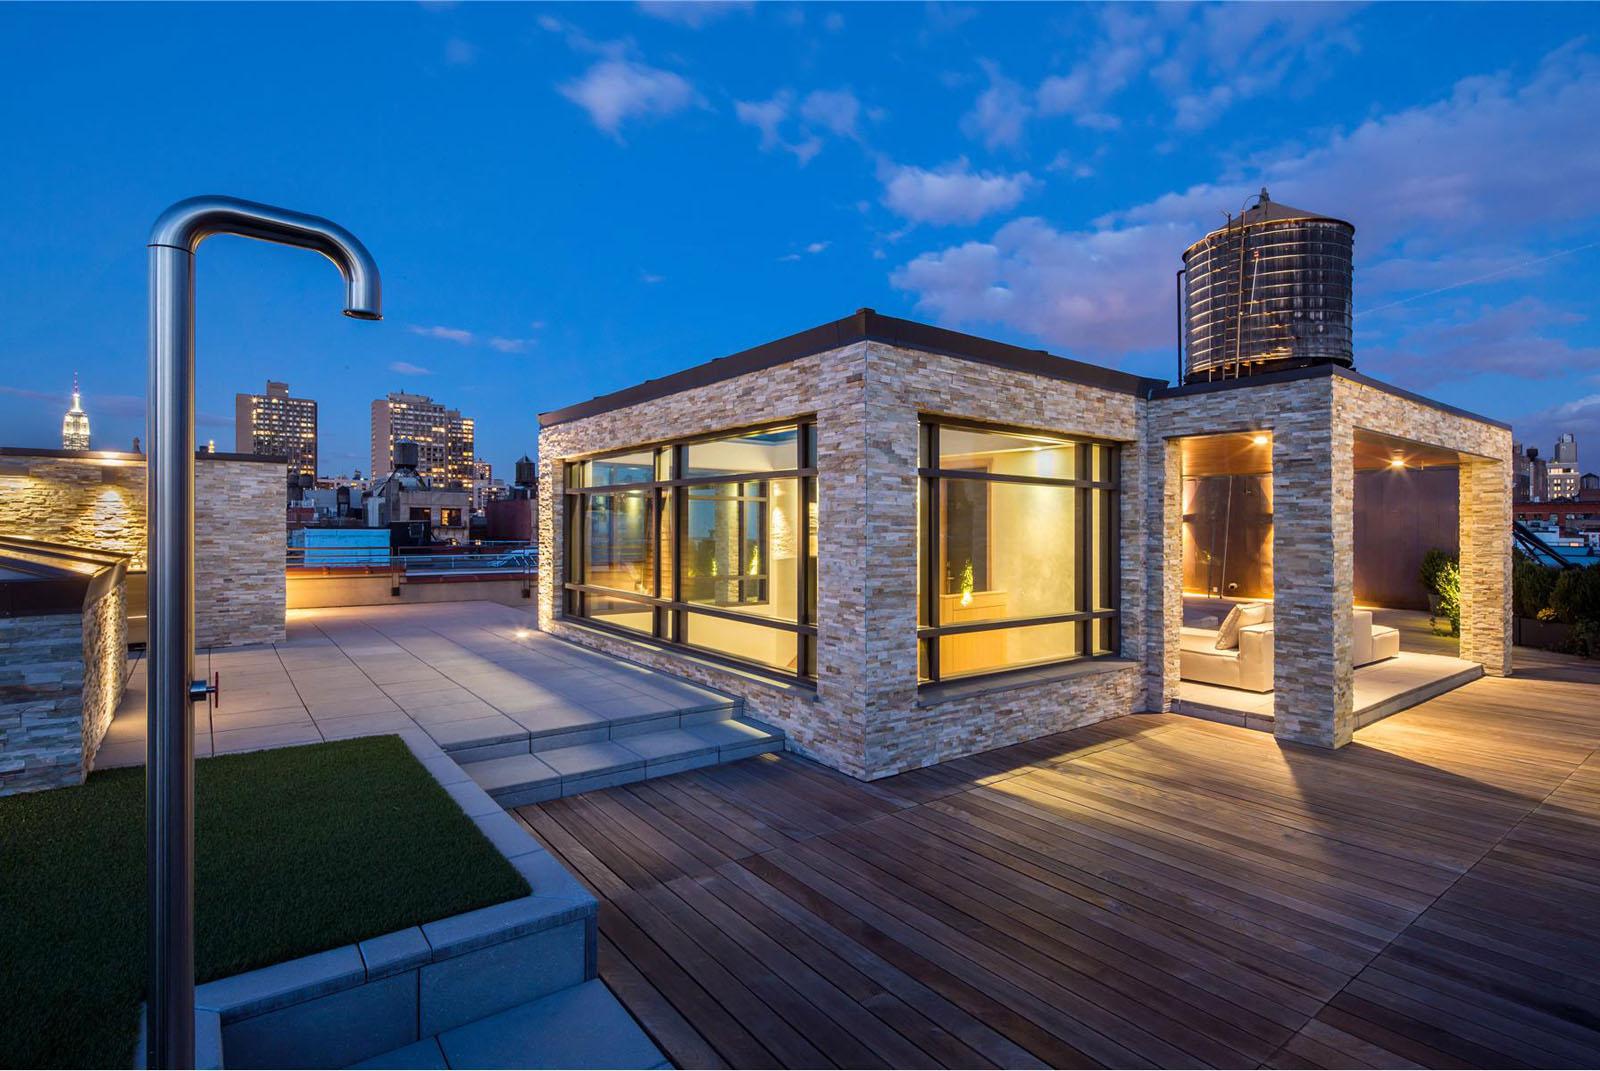 Exclusive Lower Manhattan Penthouse Loft In Soho  iDesignArch  Interior Design Architecture